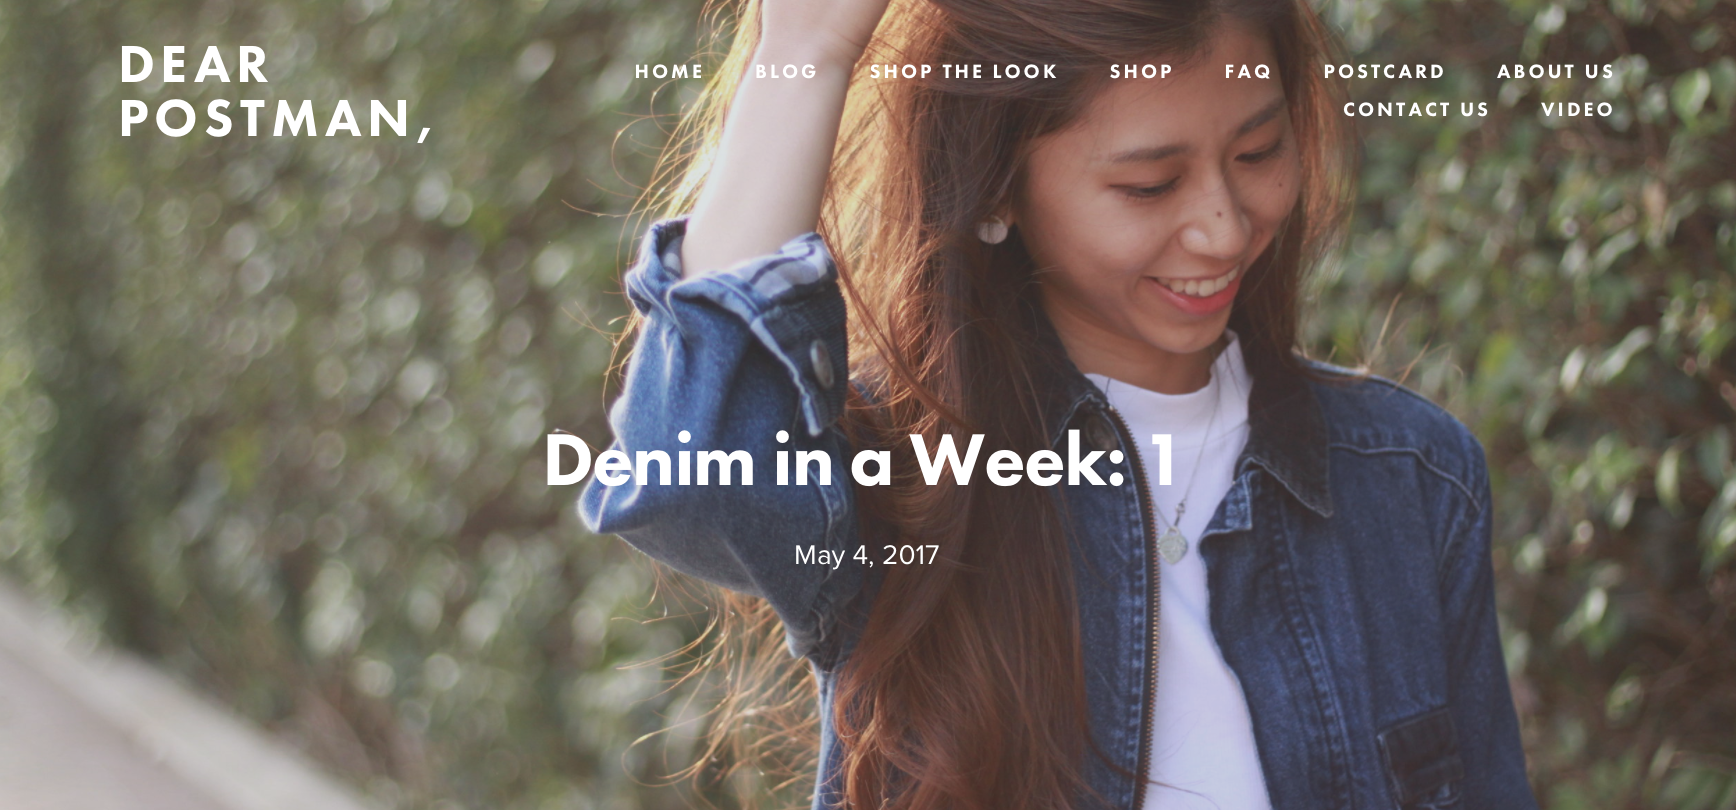 Denim in a Week: 1